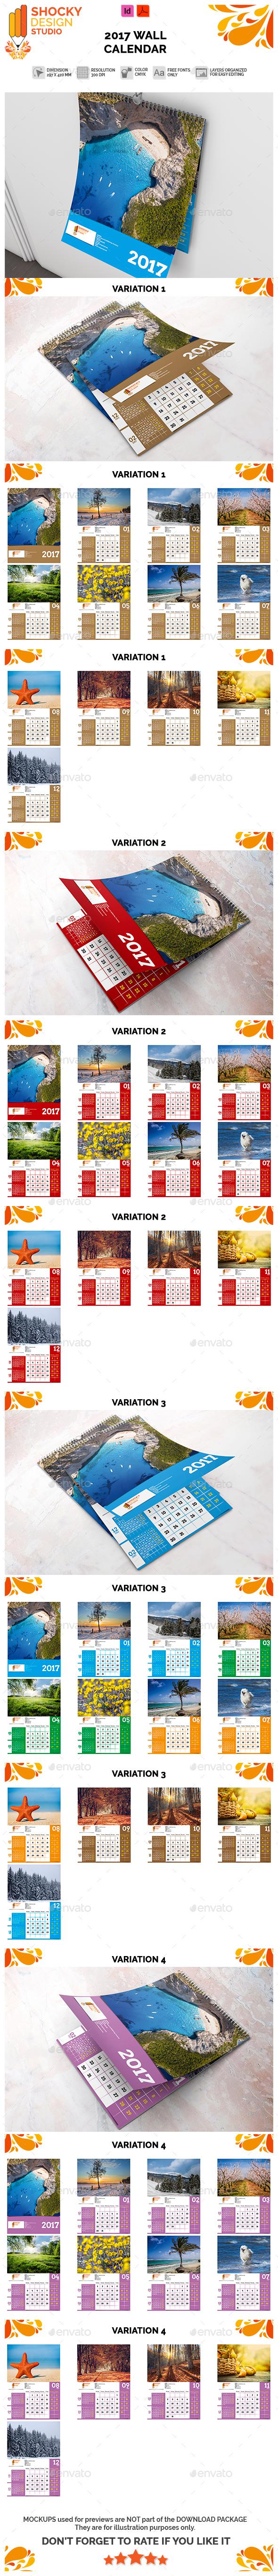 2017 Wall Calendar - Calendars Stationery